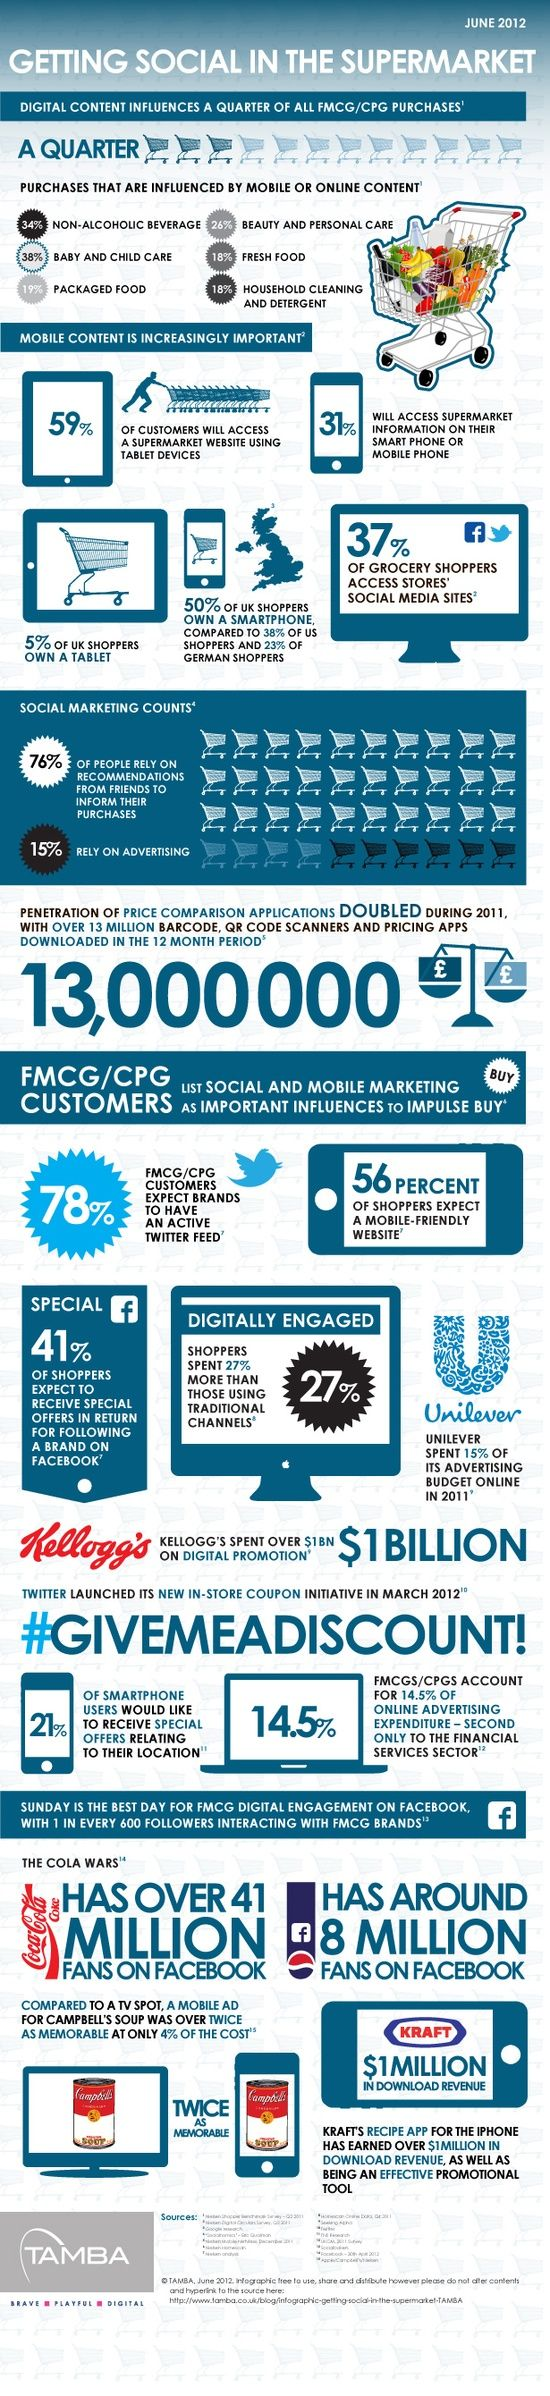 FMCG and digital...